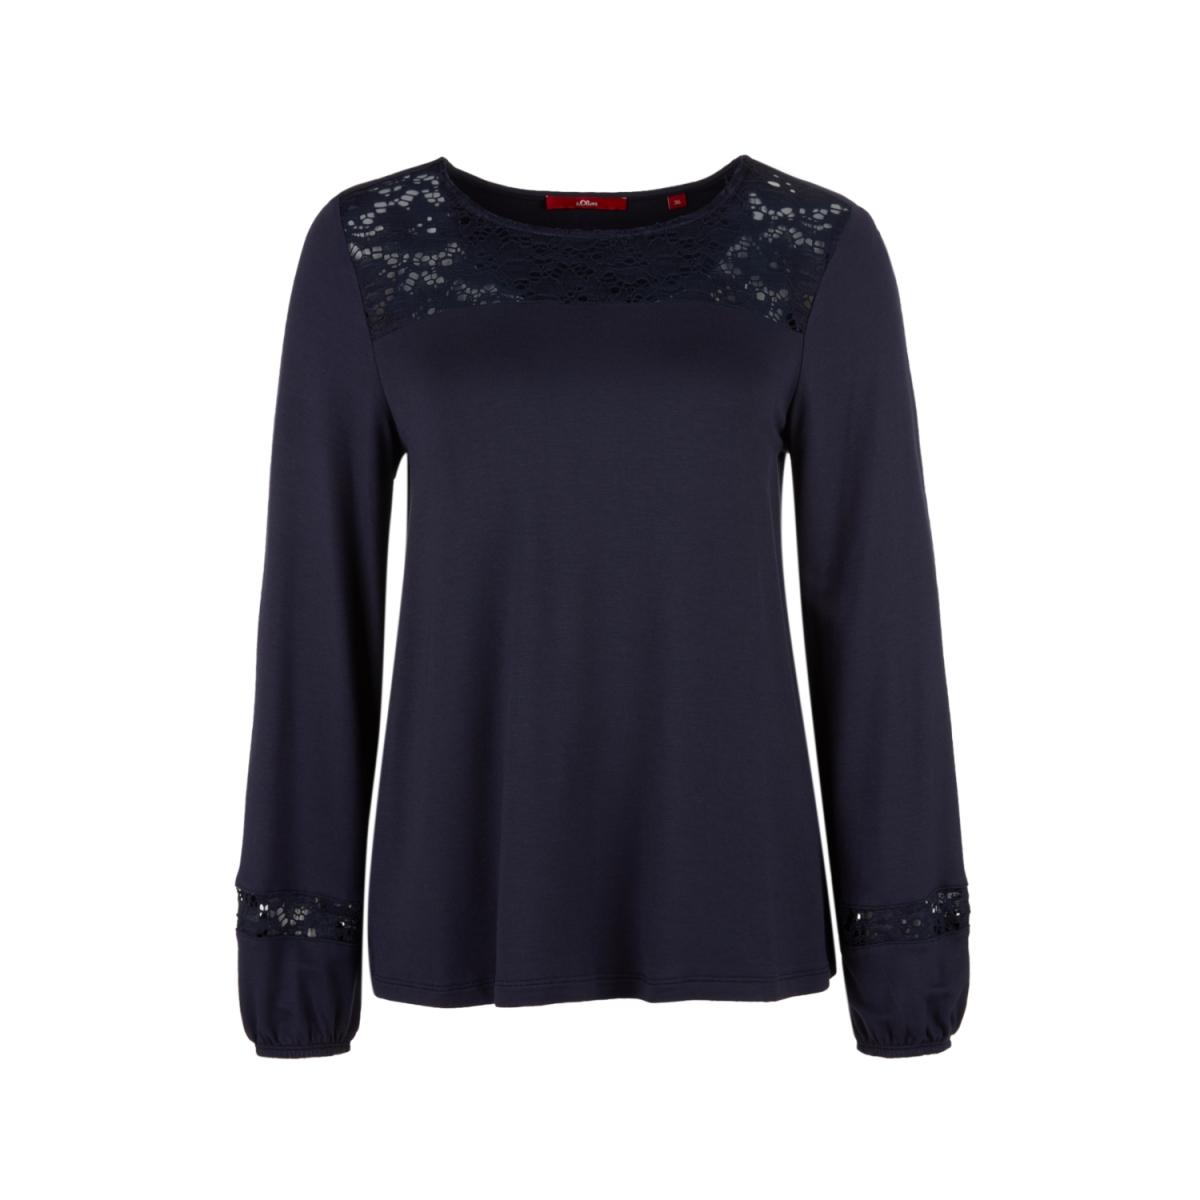 14812316540 s.oliver t-shirt 5959